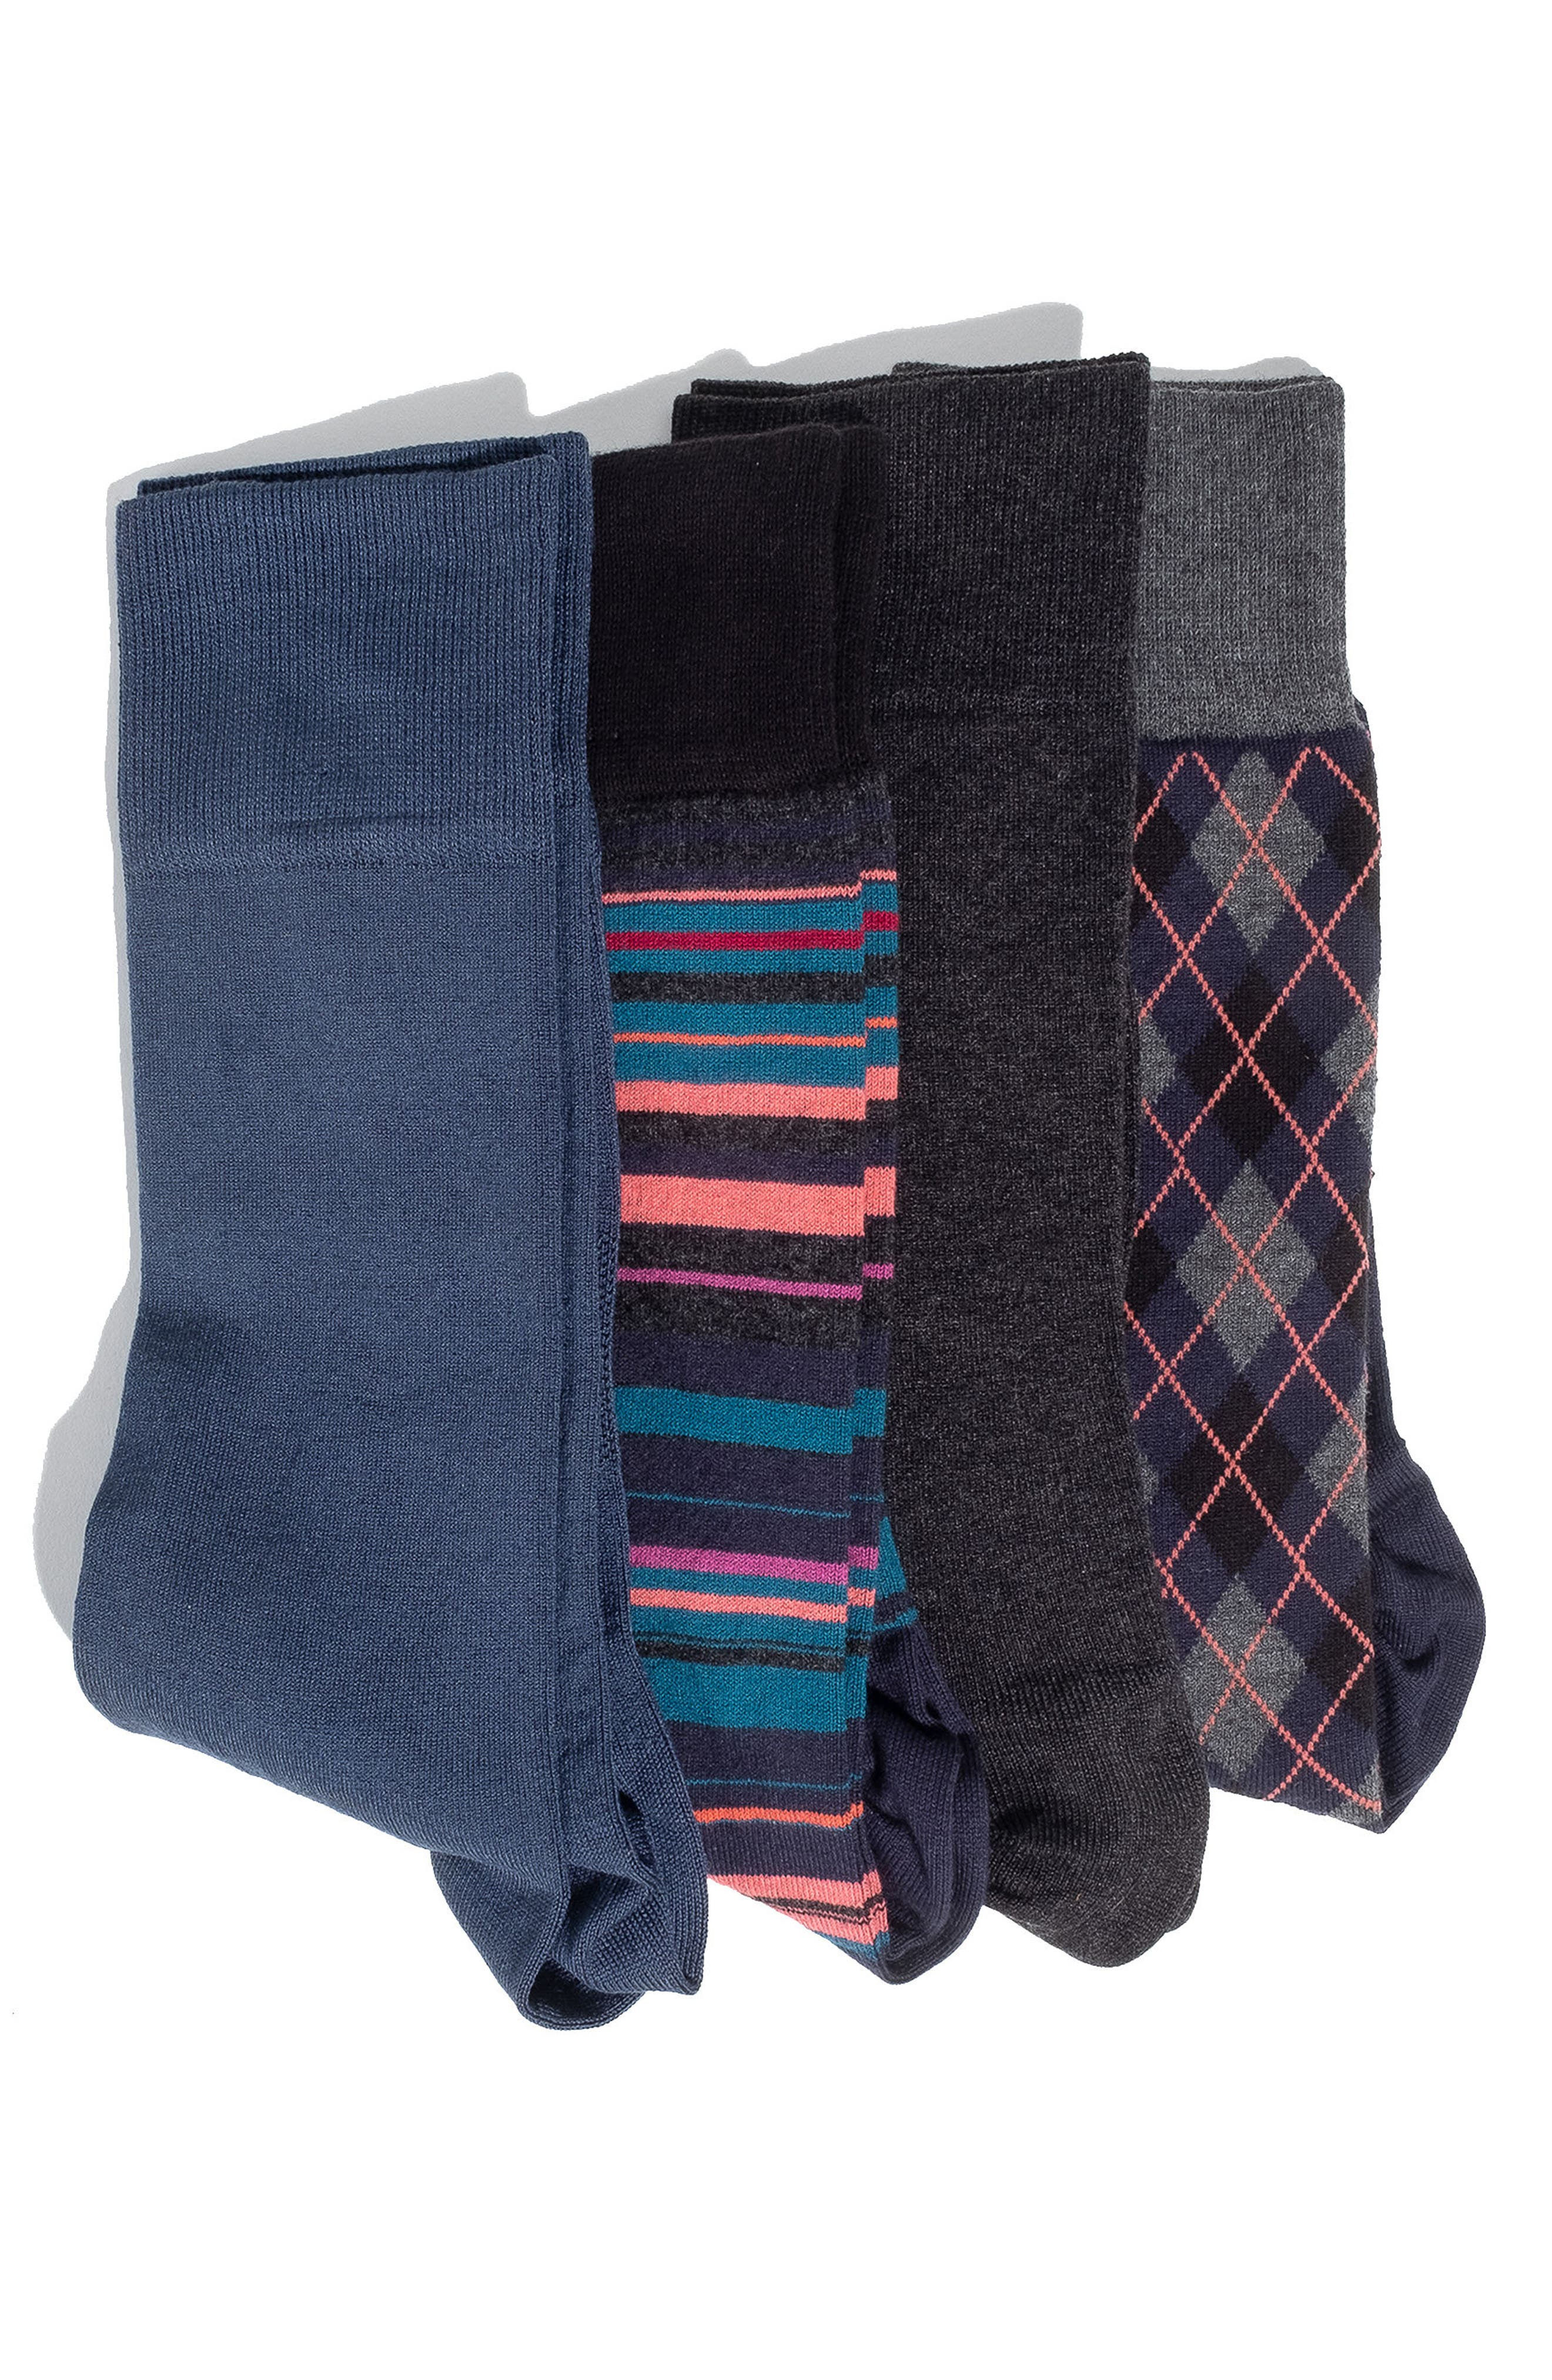 4-Pack Socks,                         Main,                         color,